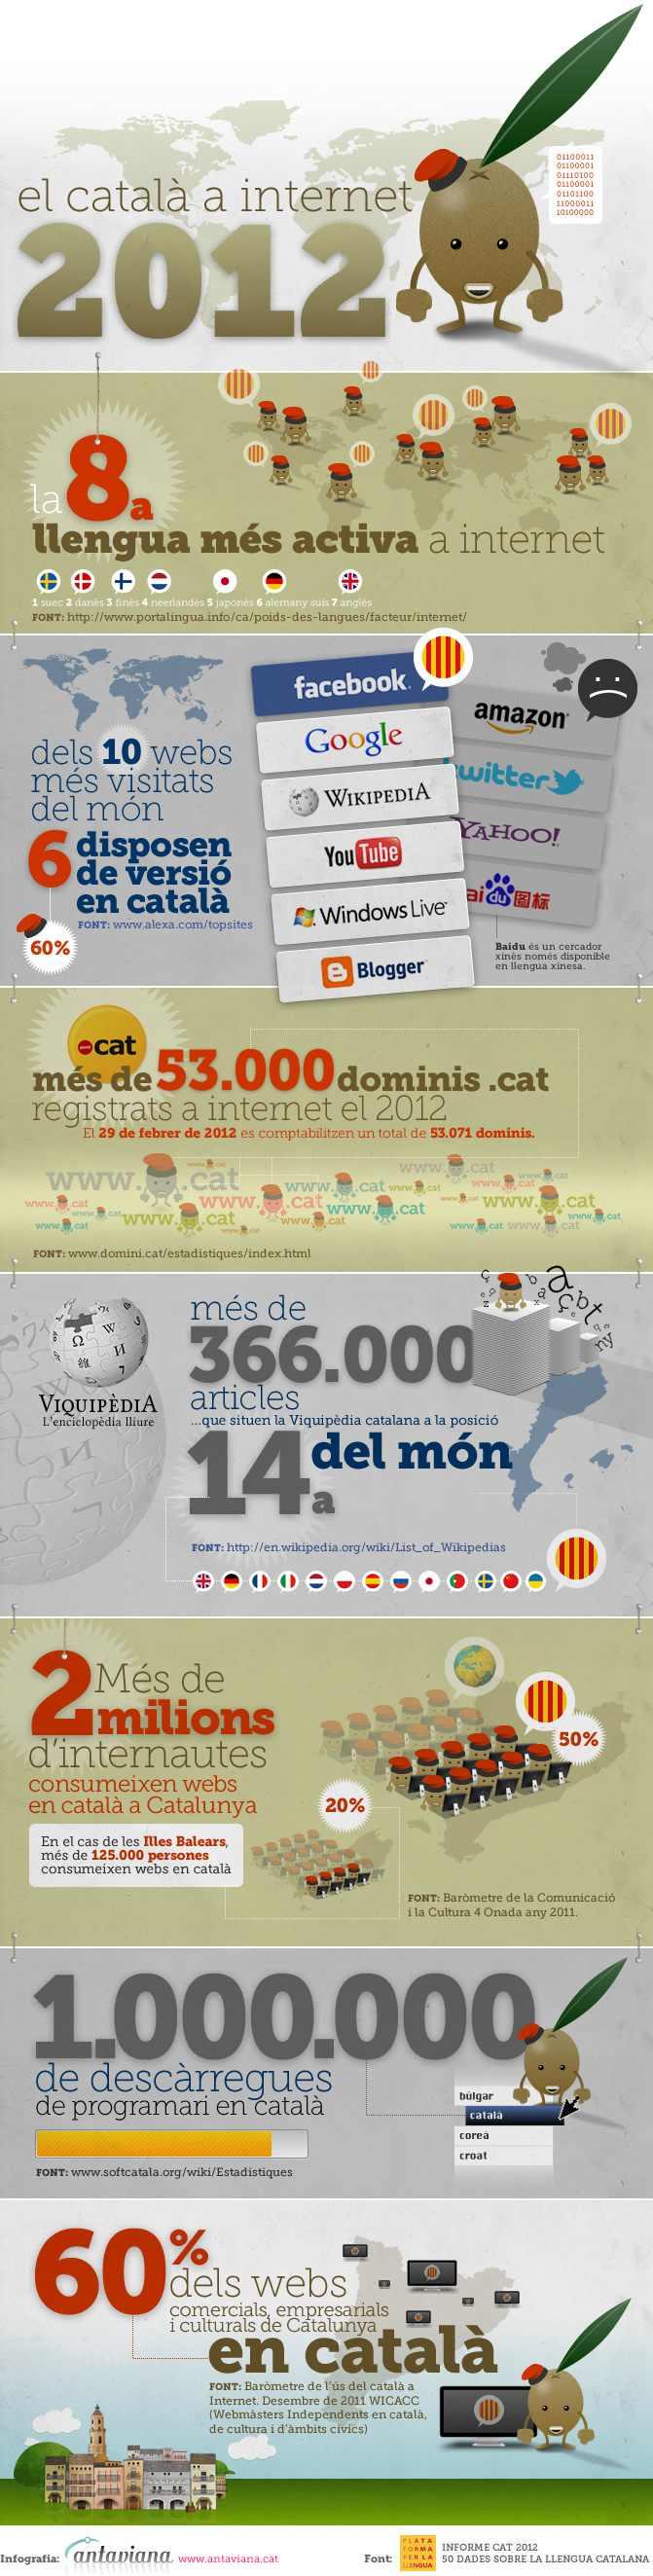 Infografia de Antaviana sobre el català a internet